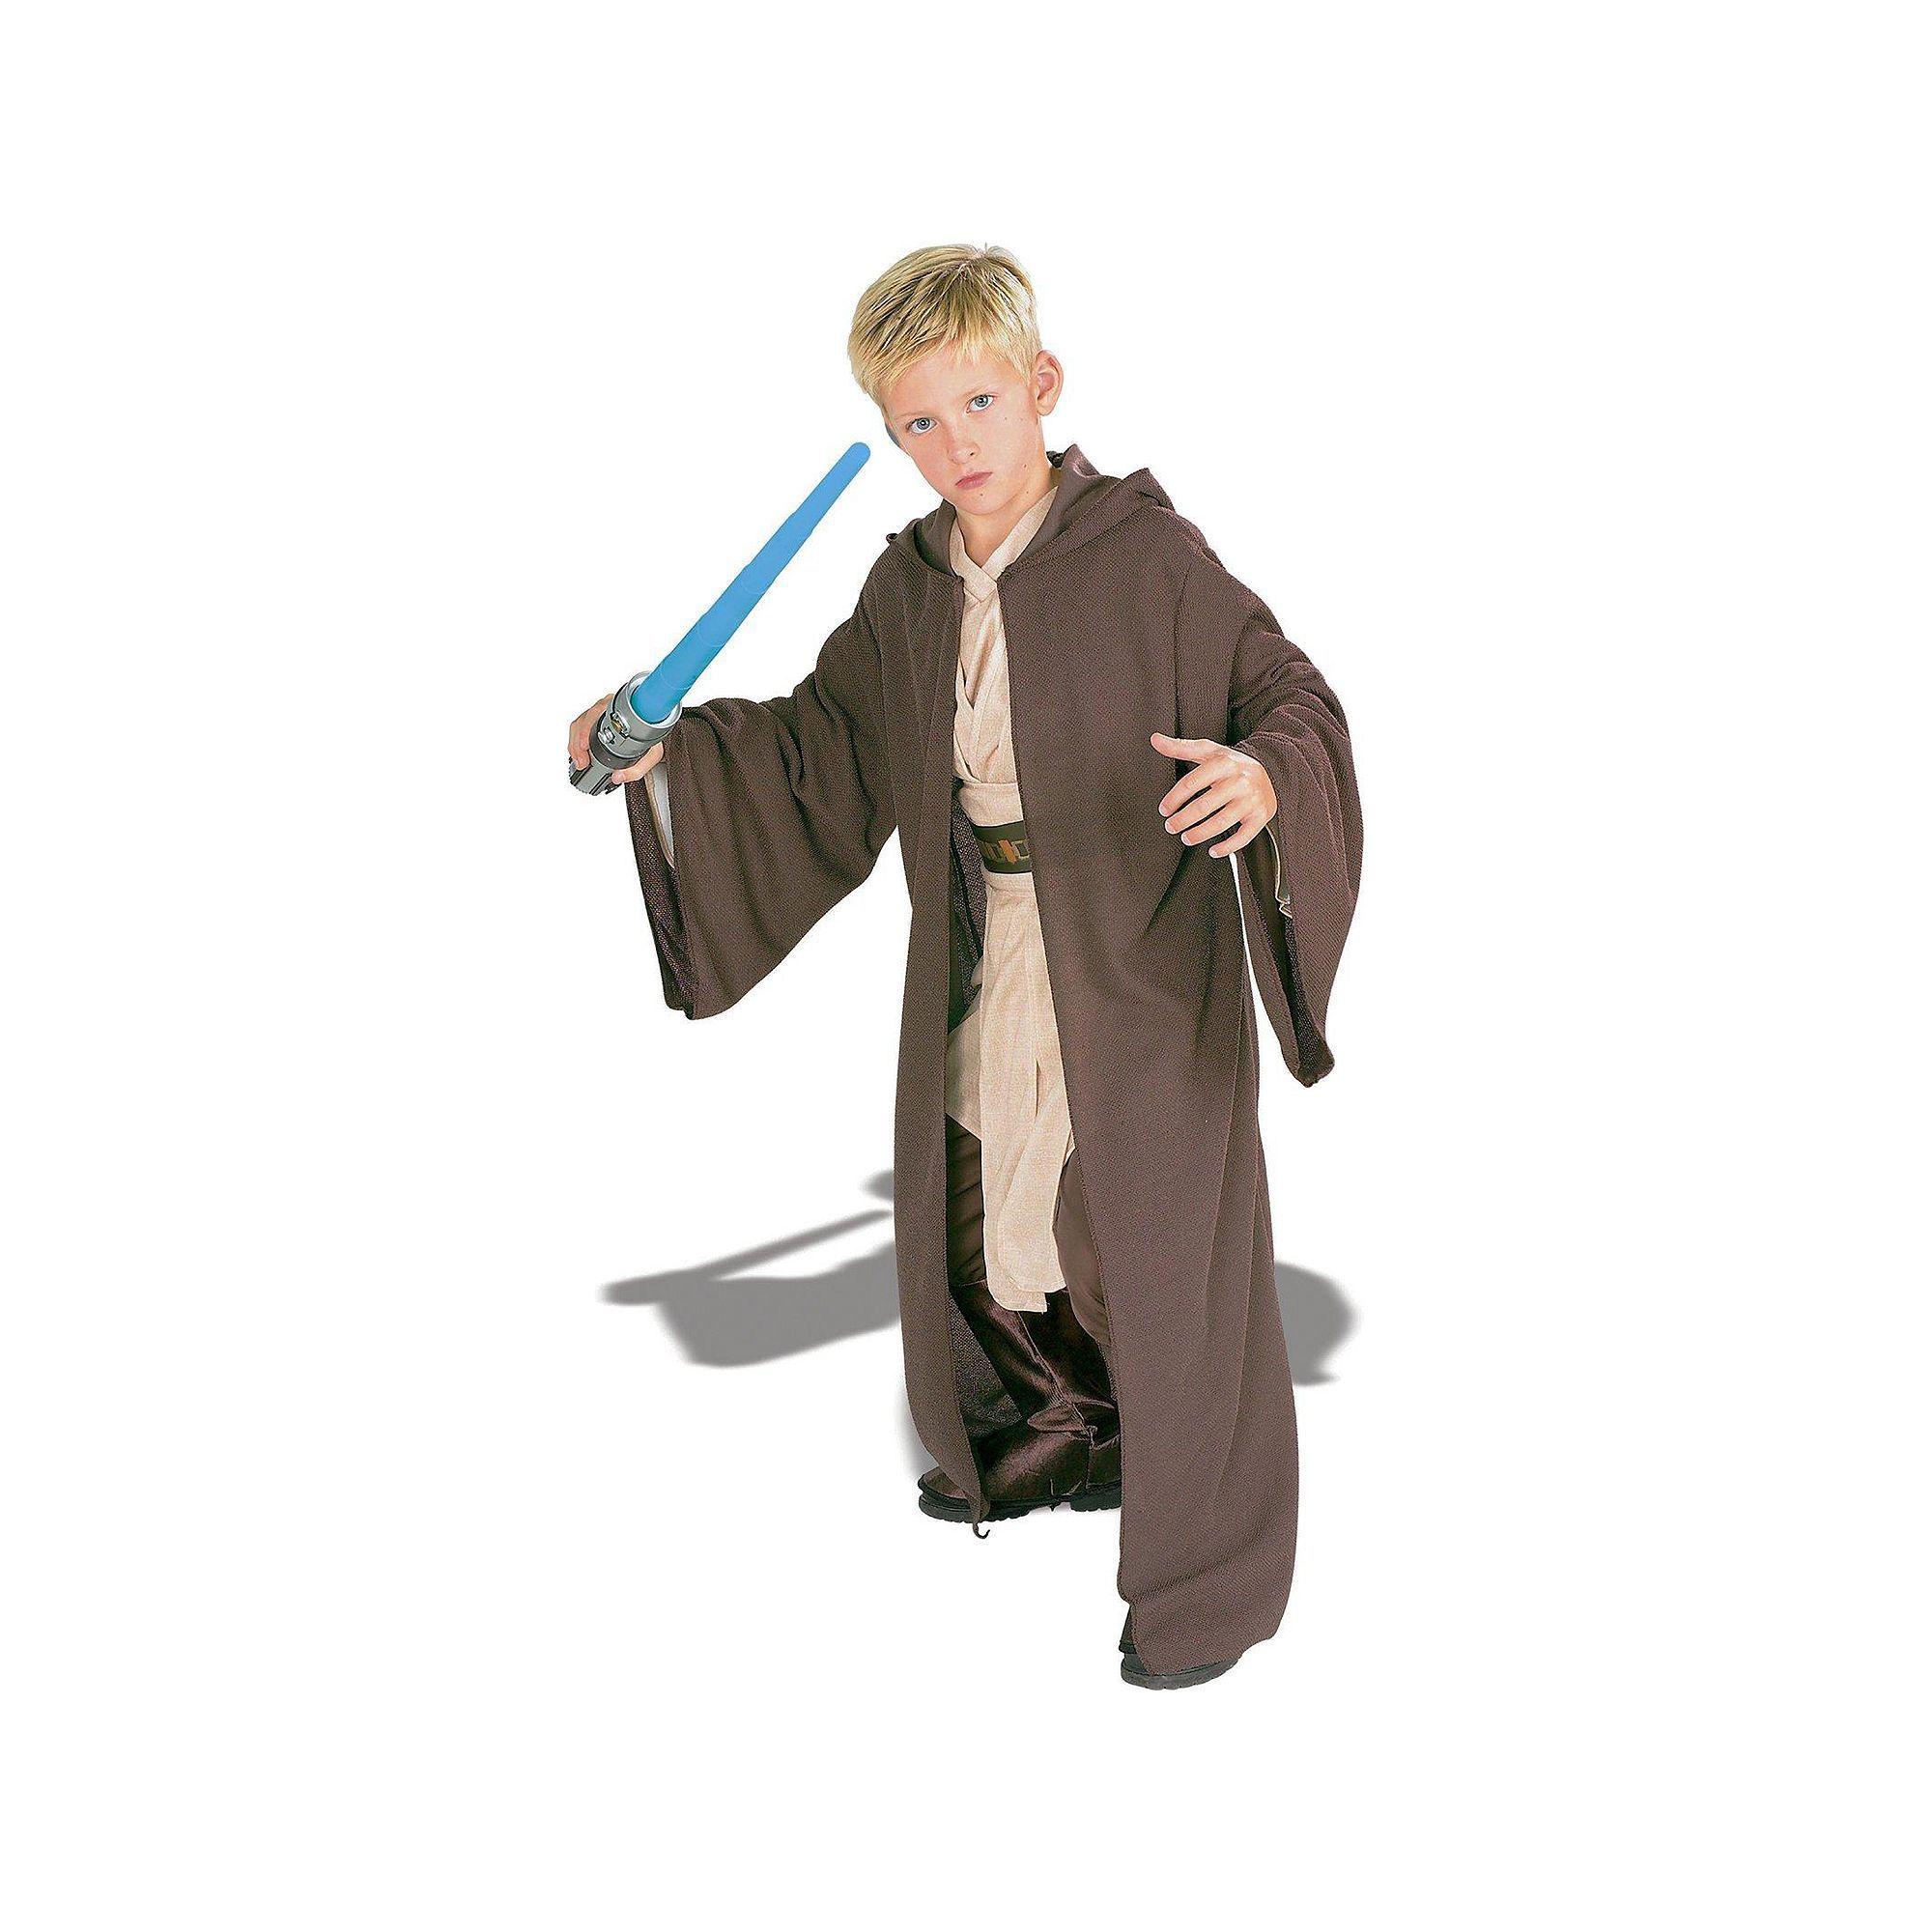 Star Wars Jedi Robe Costume - Kids Boyu0027s Size Medium ...  sc 1 st  Pinterest & Star Wars Jedi Robe Costume - Kids Boyu0027s Size: Medium Brown ...